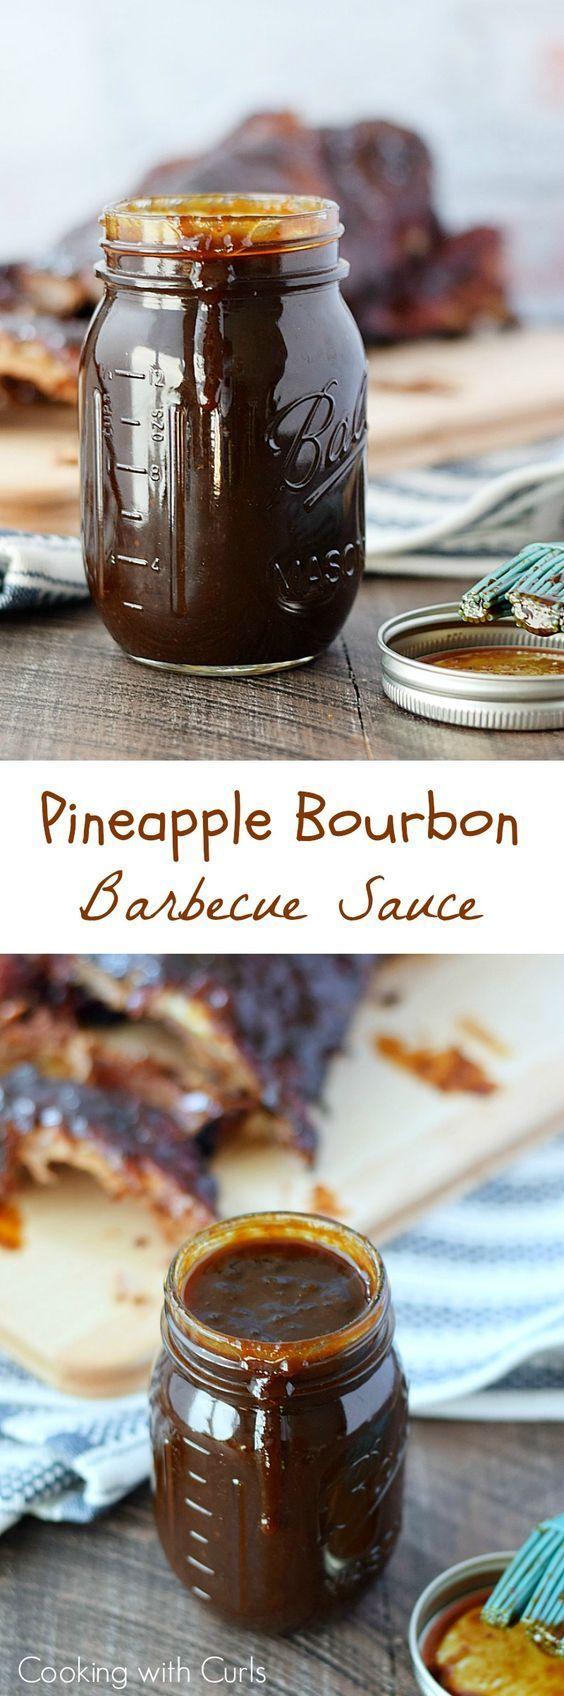 Pineapple Bourbon Barbecue SauceMerissa | Little House Living | Simple Living + Homestead Living + Frugal Living